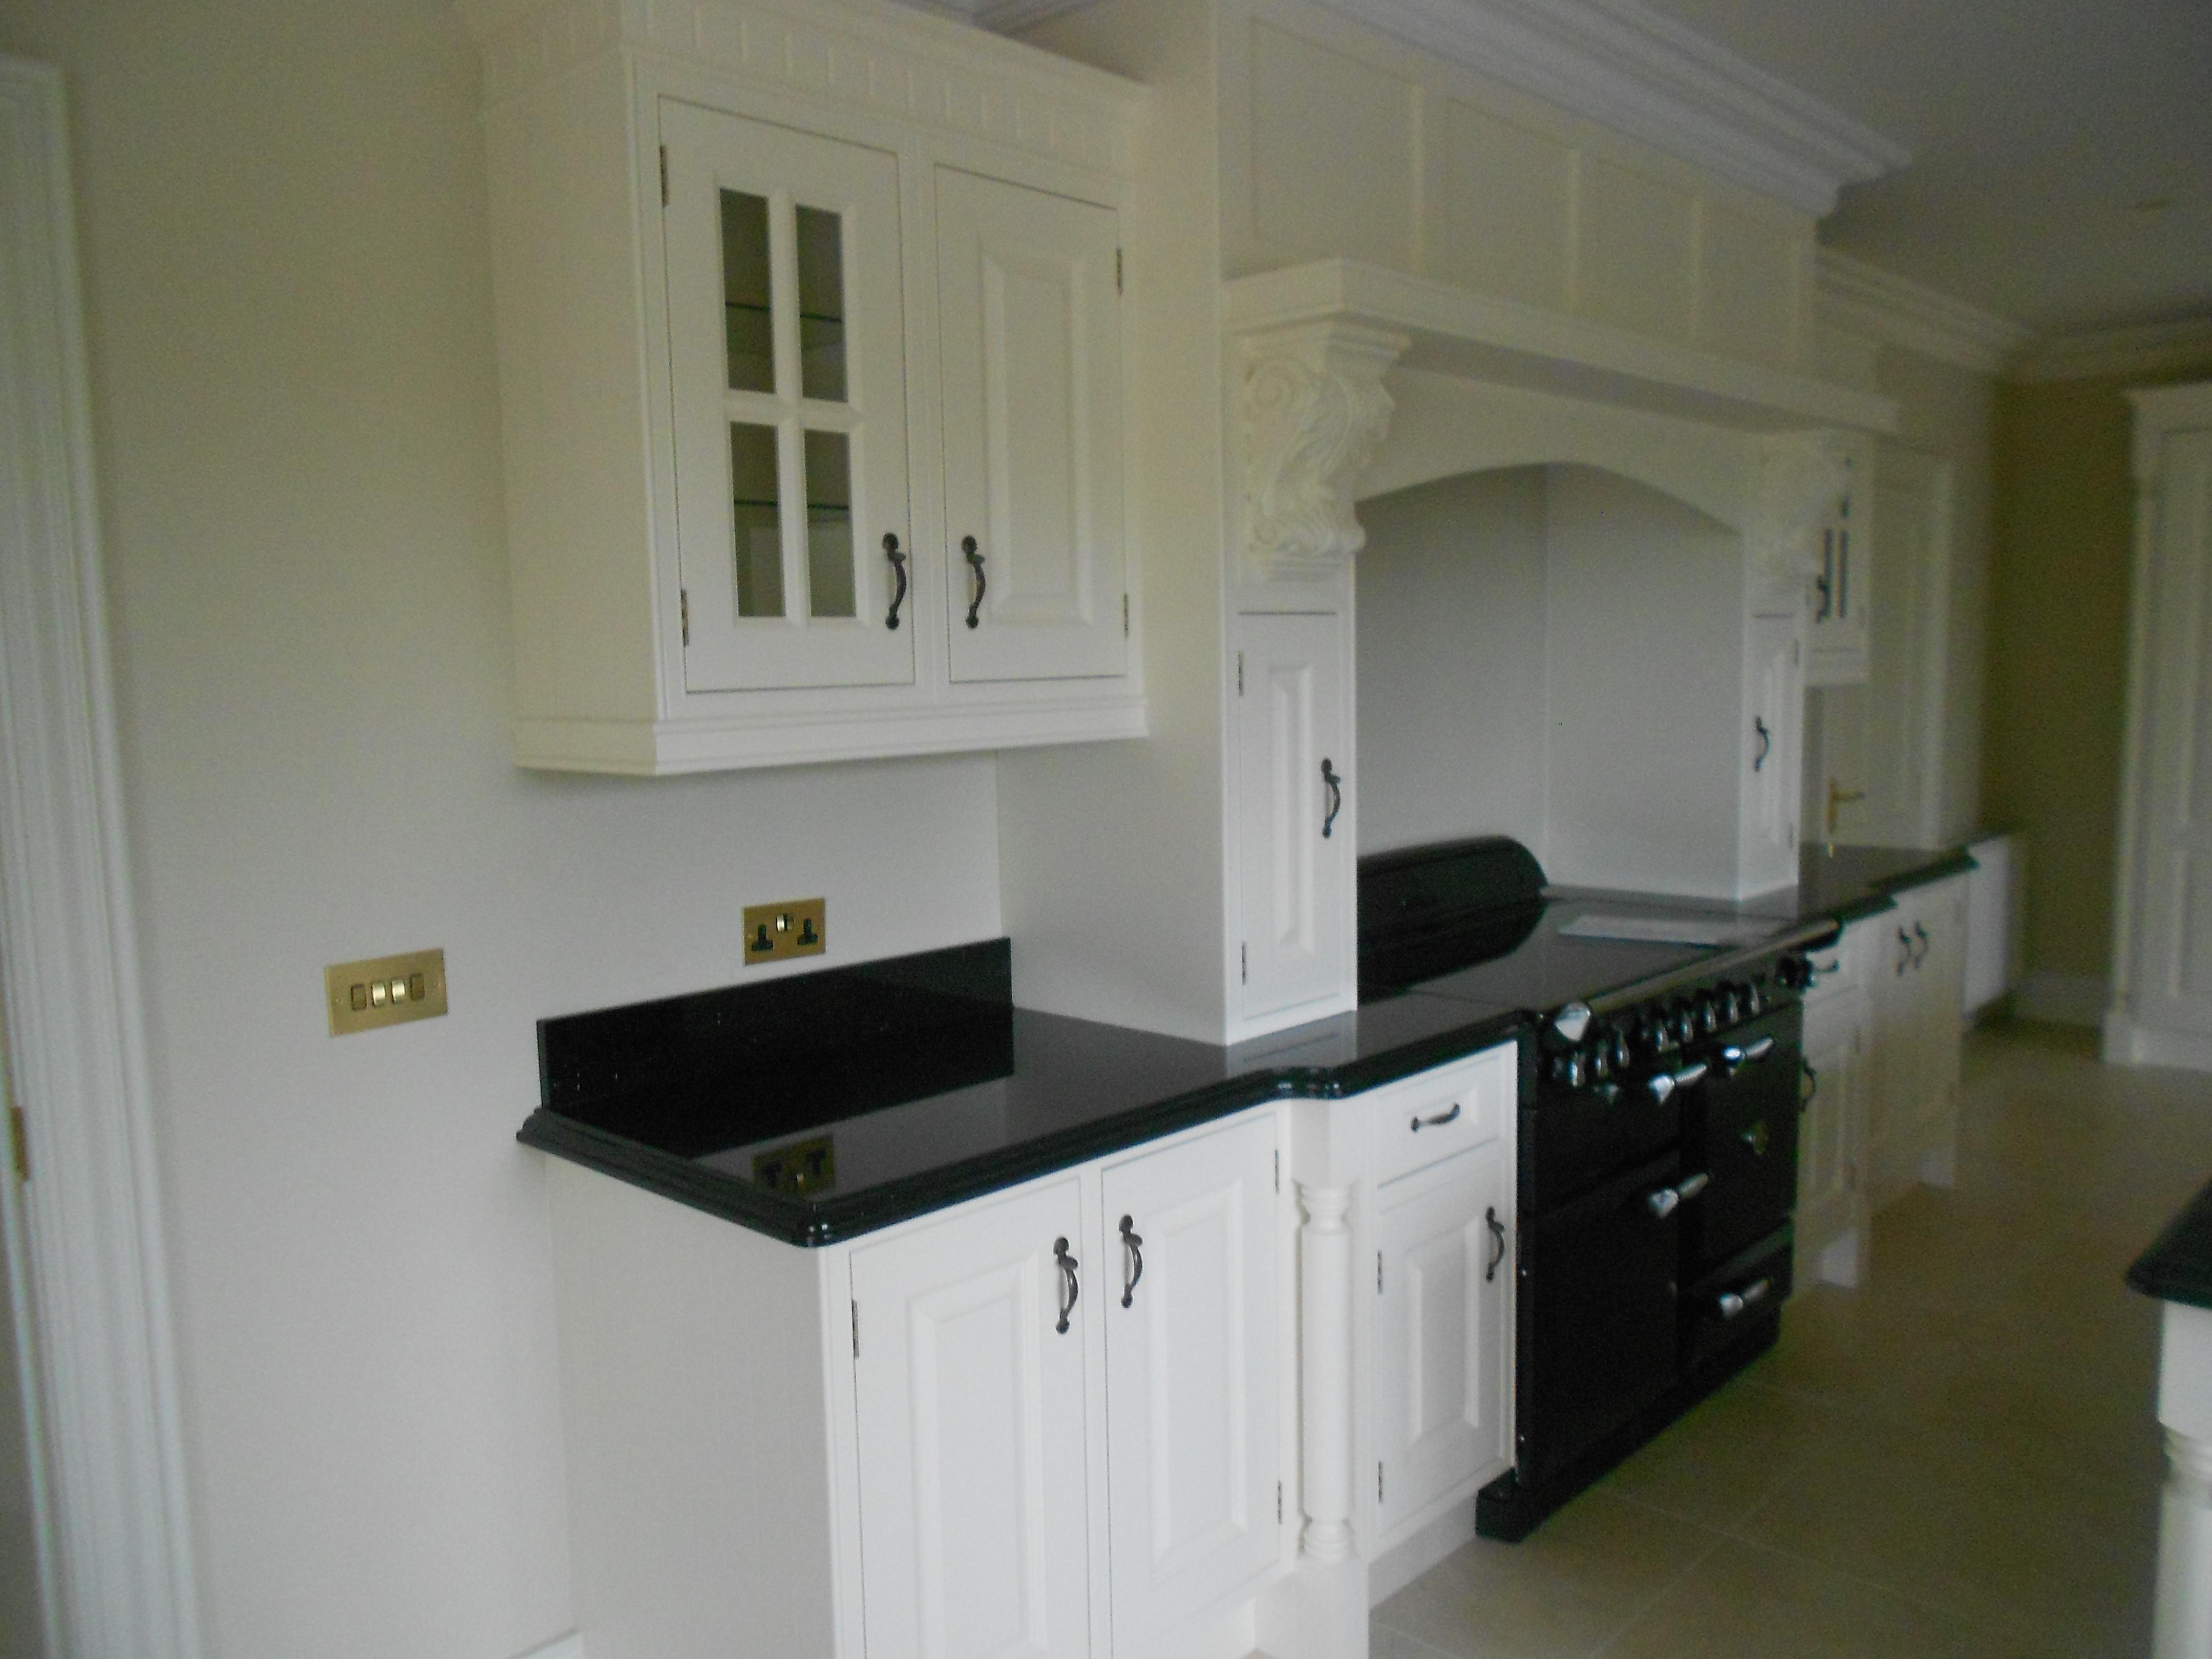 Kitchen Granite Worktop and Cabinets